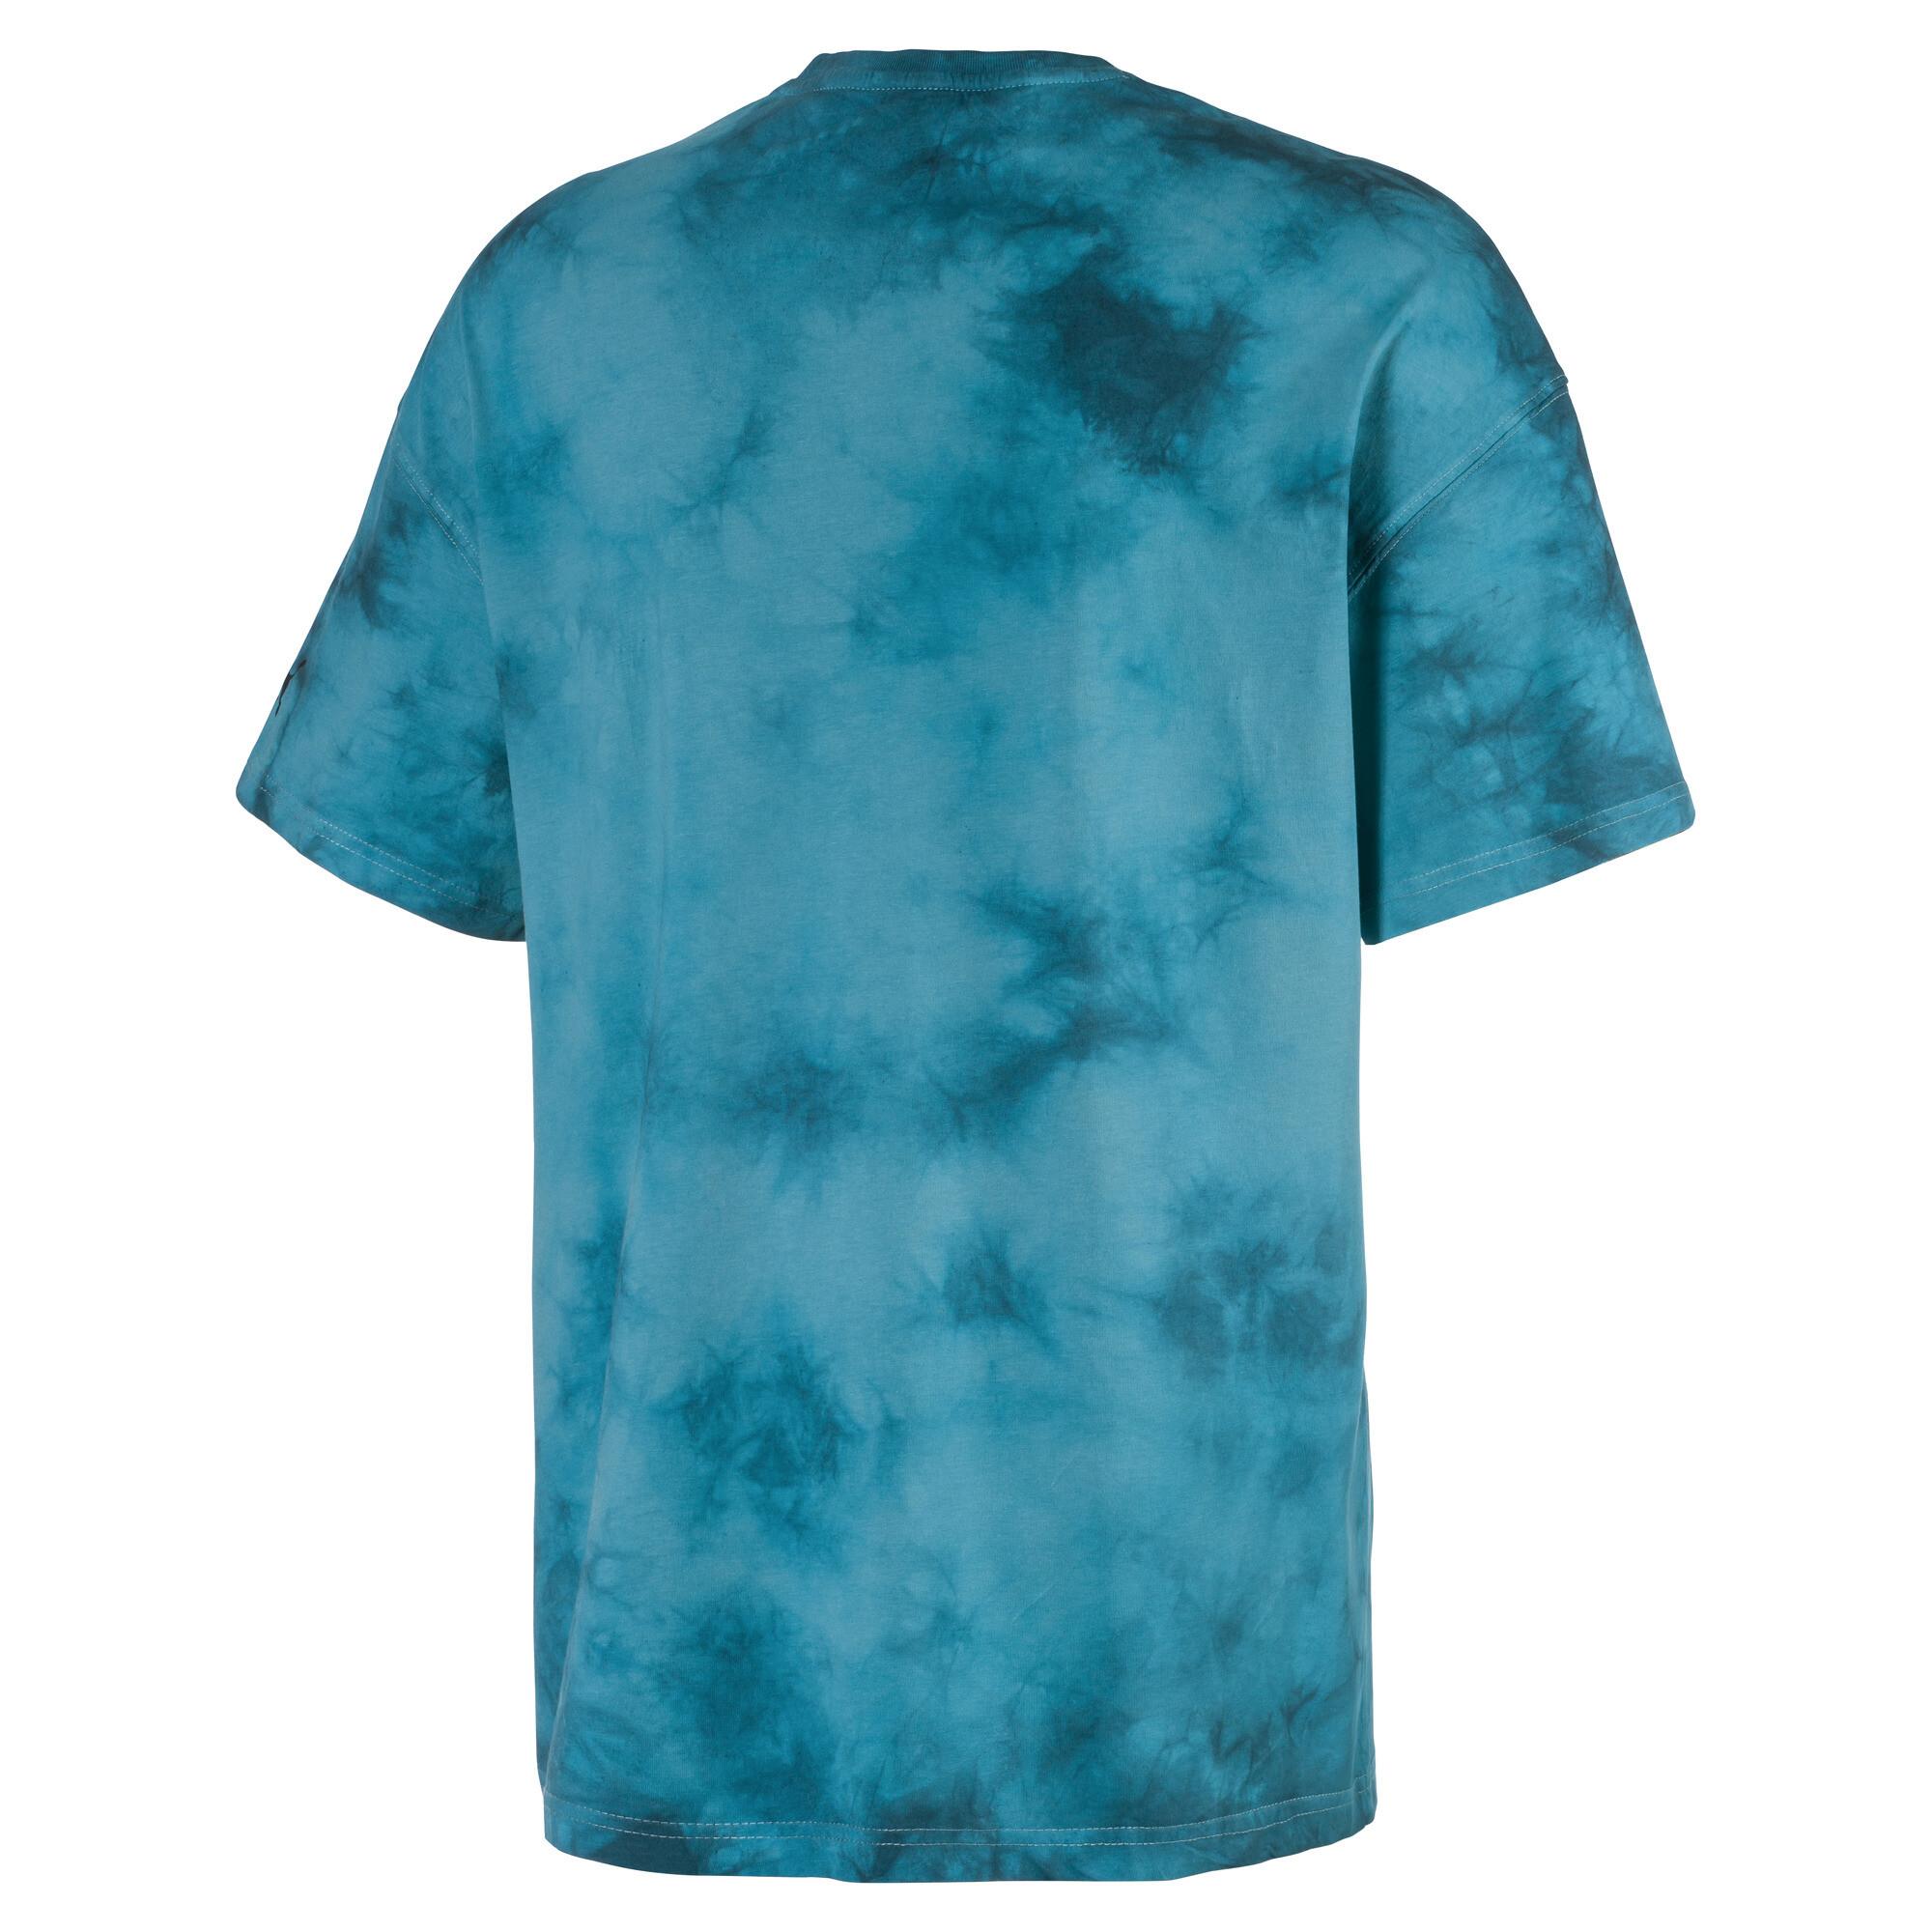 PUMA-Boxy-Herren-T-Shirt-Maenner-T-Shirt-Neu Indexbild 7